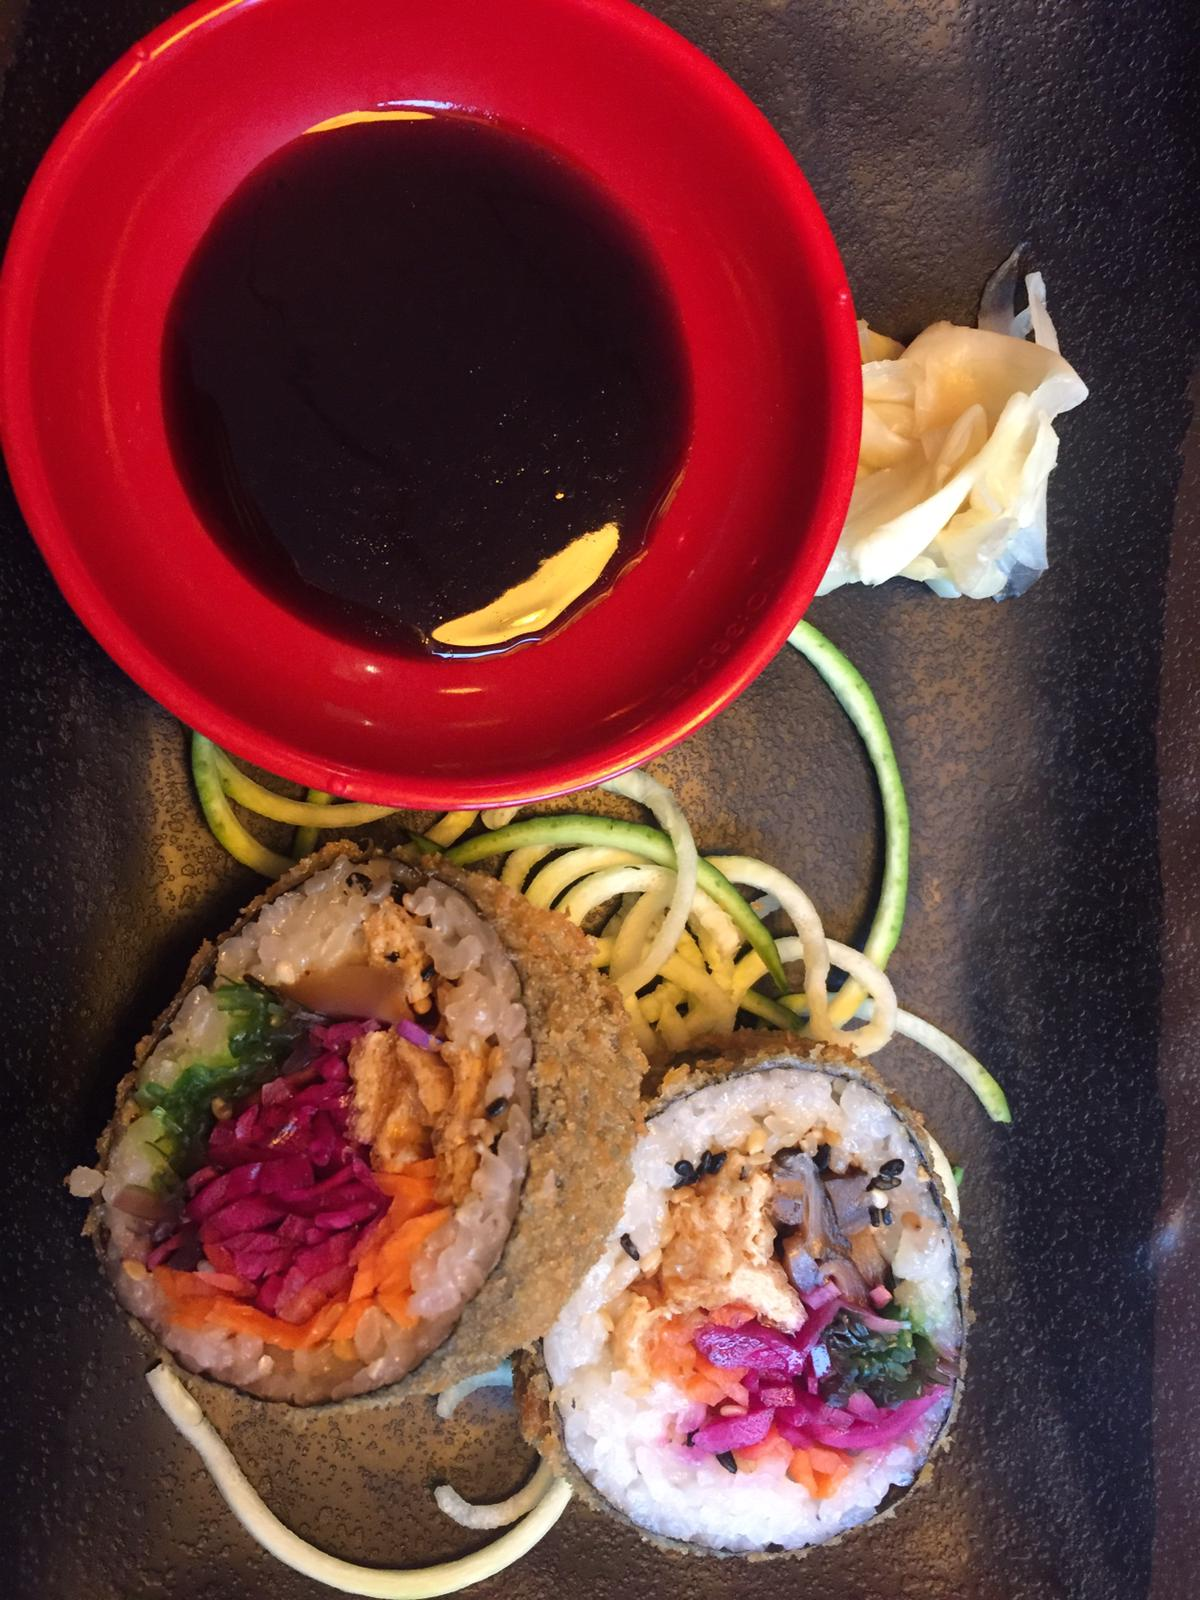 Kyodaina Poke & Sushi - wie wär's?